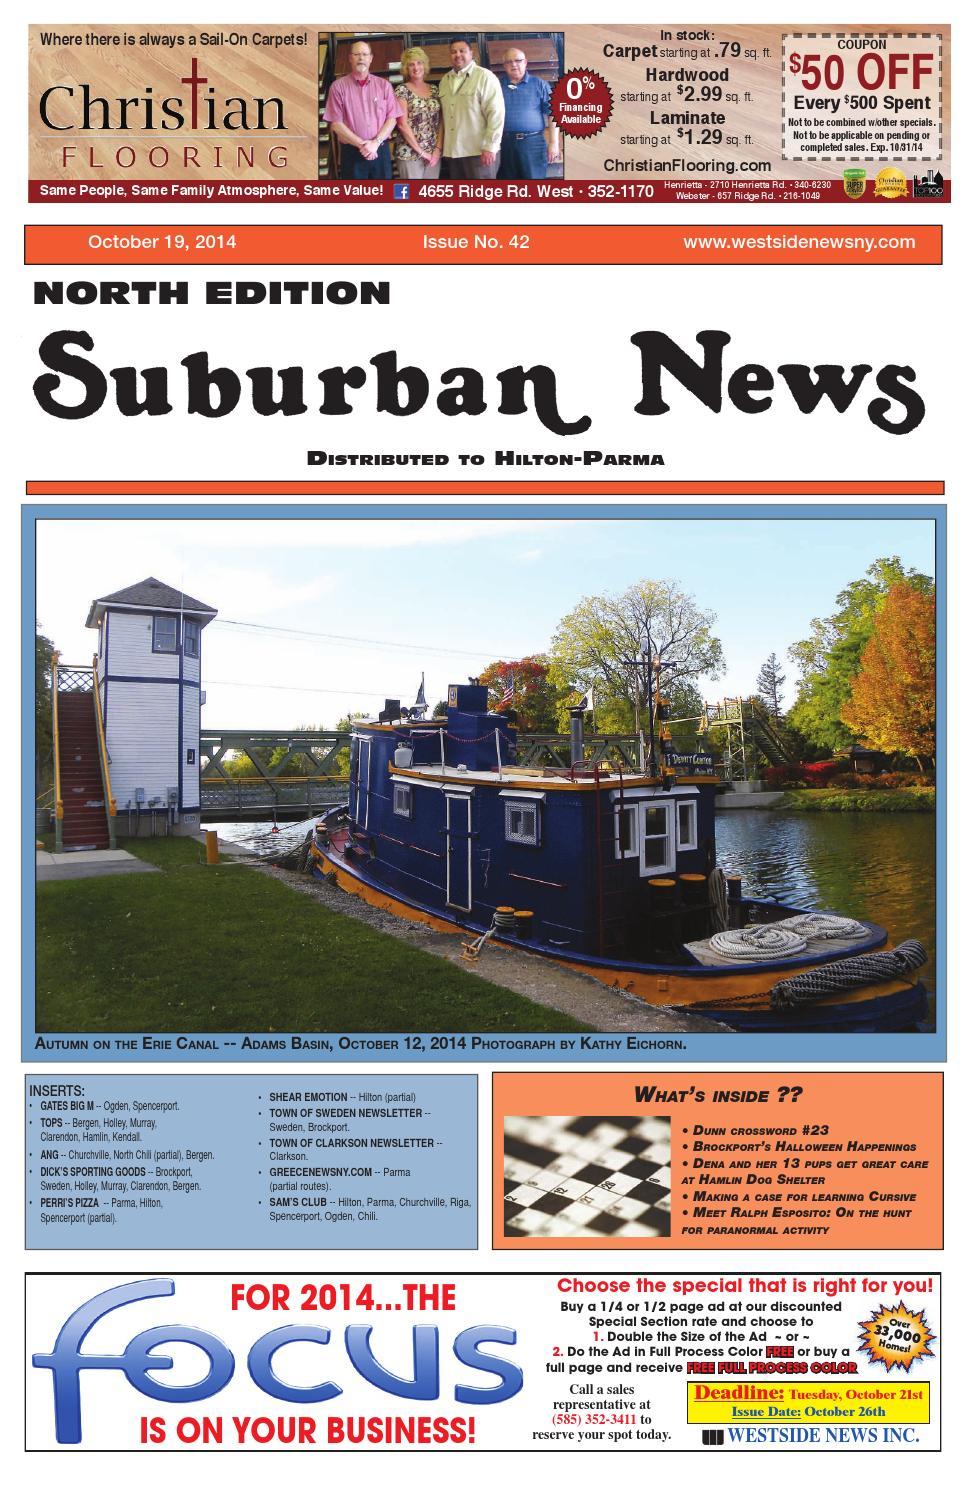 Suburban News North Edition - October 19, 2014 by Westside News Inc. - issuu